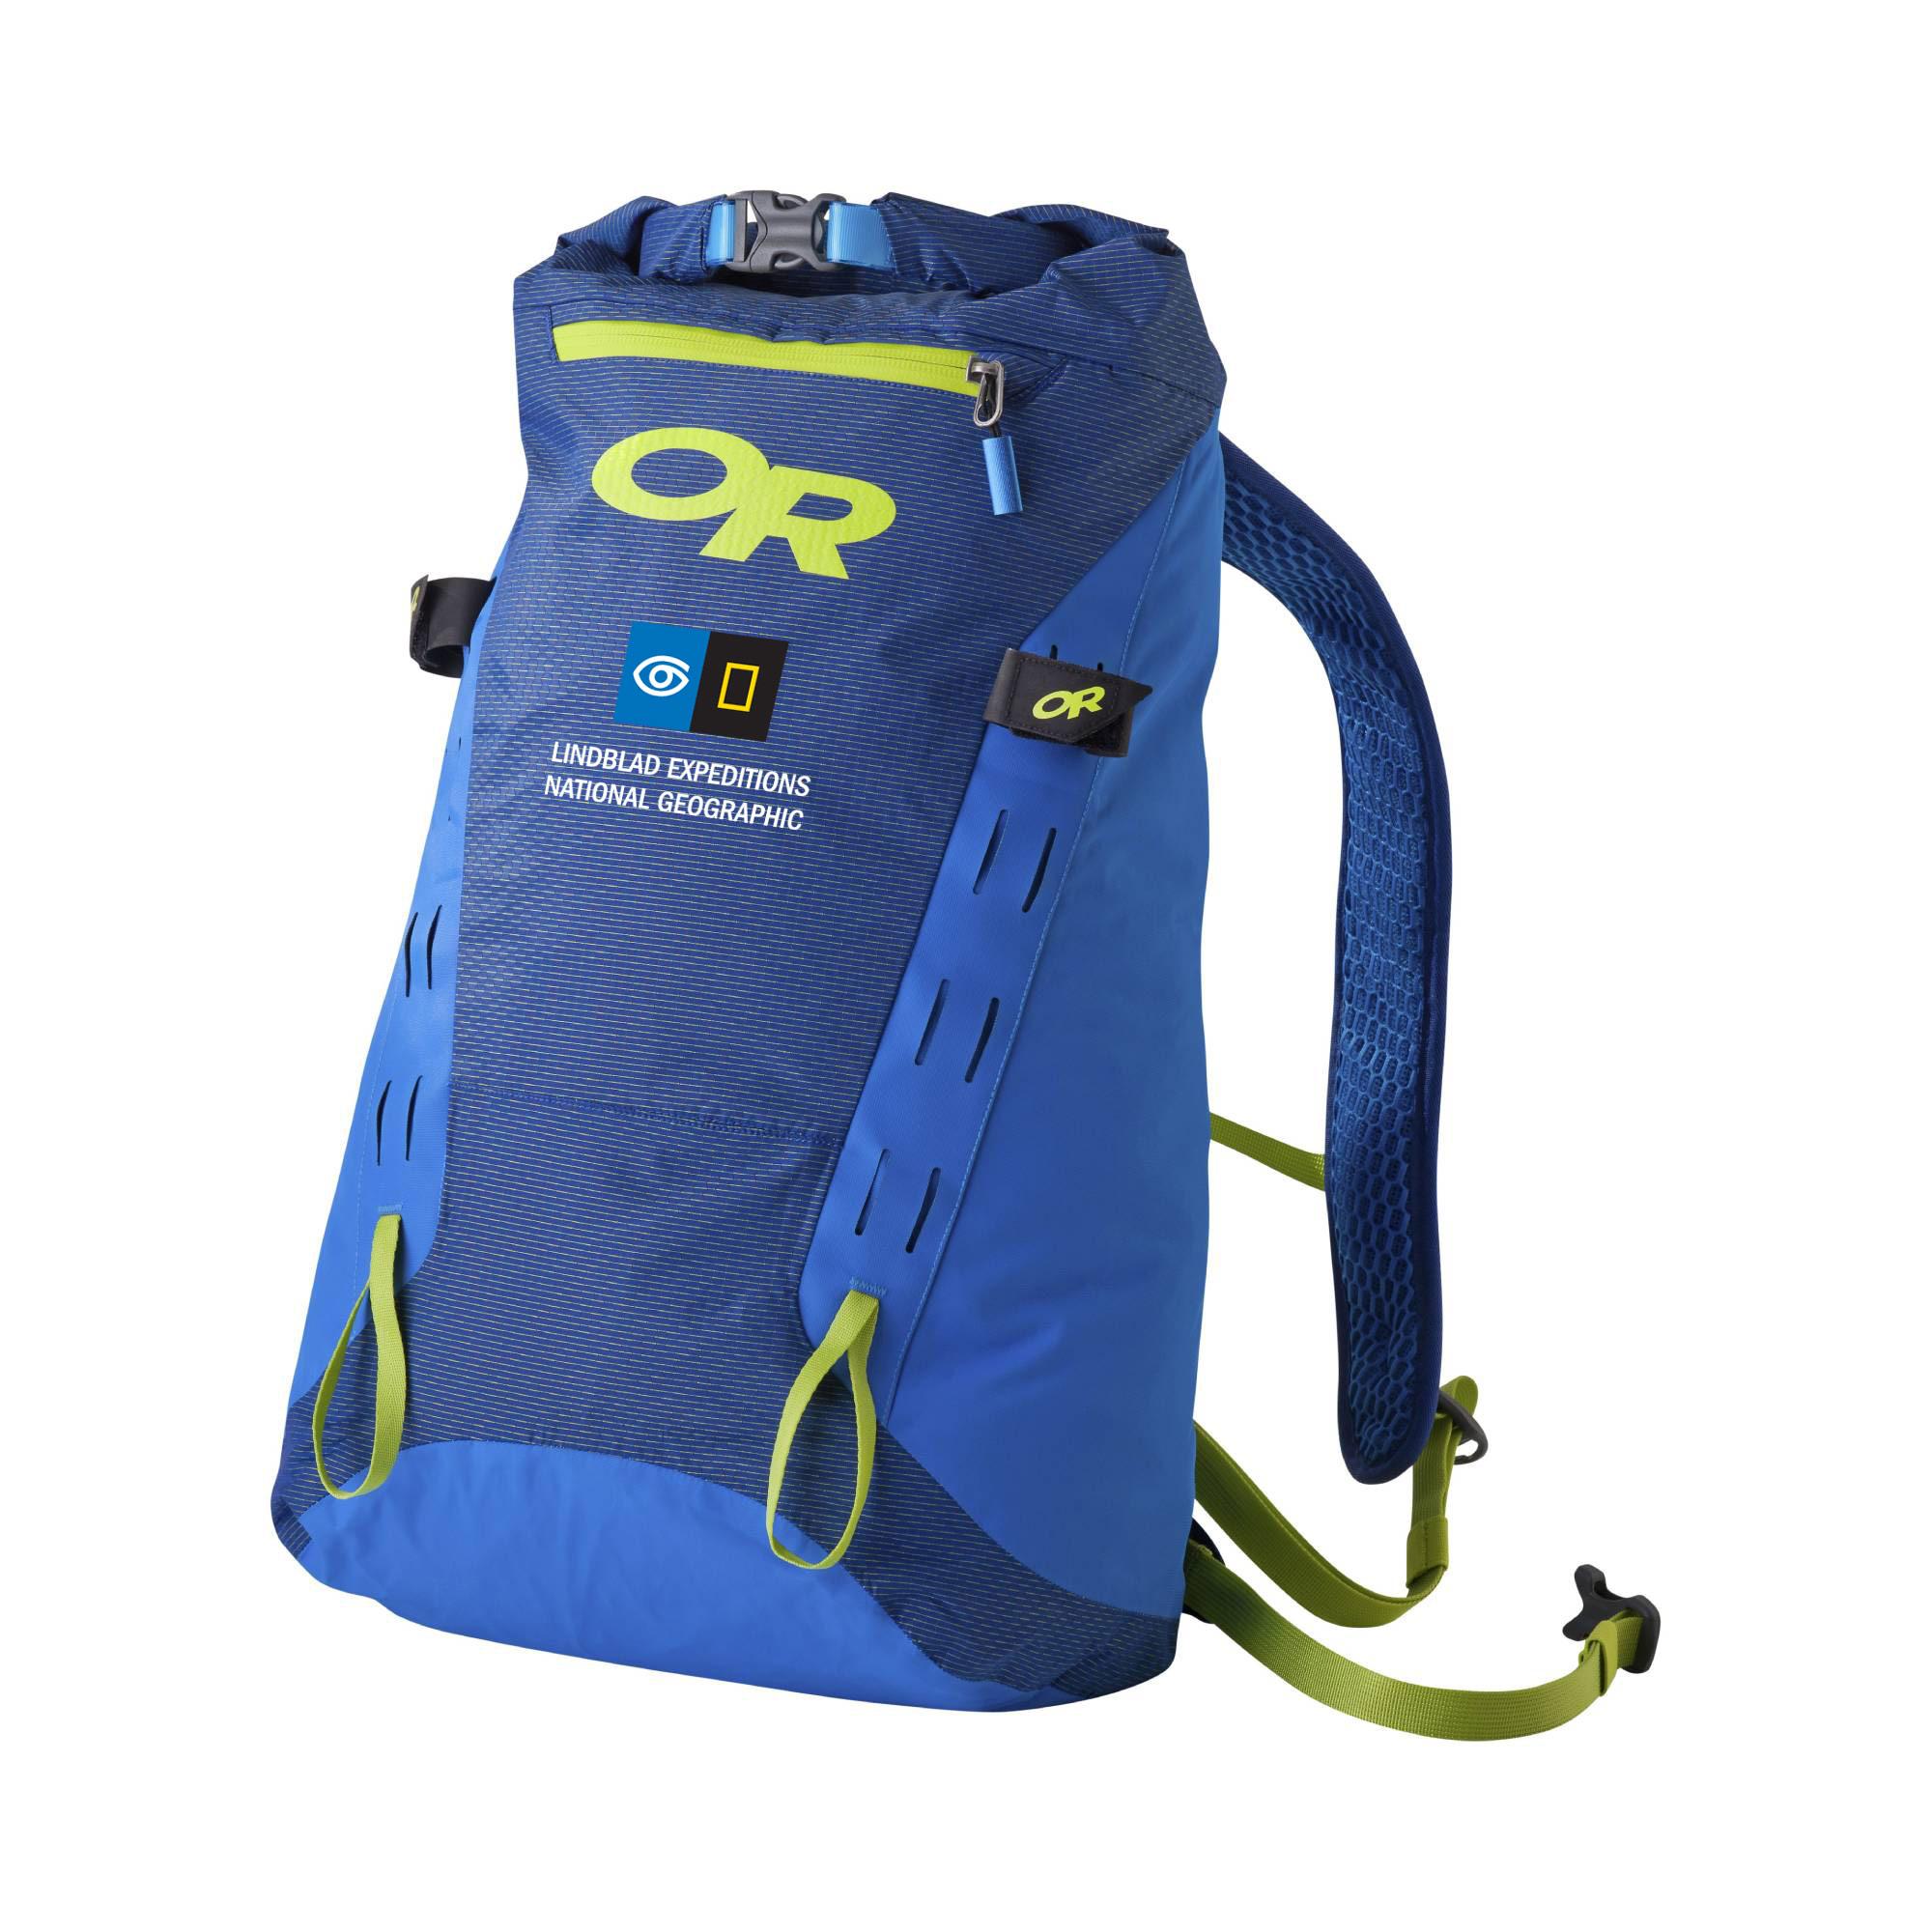 Dry Summit Pack LT with Lindblad Logo